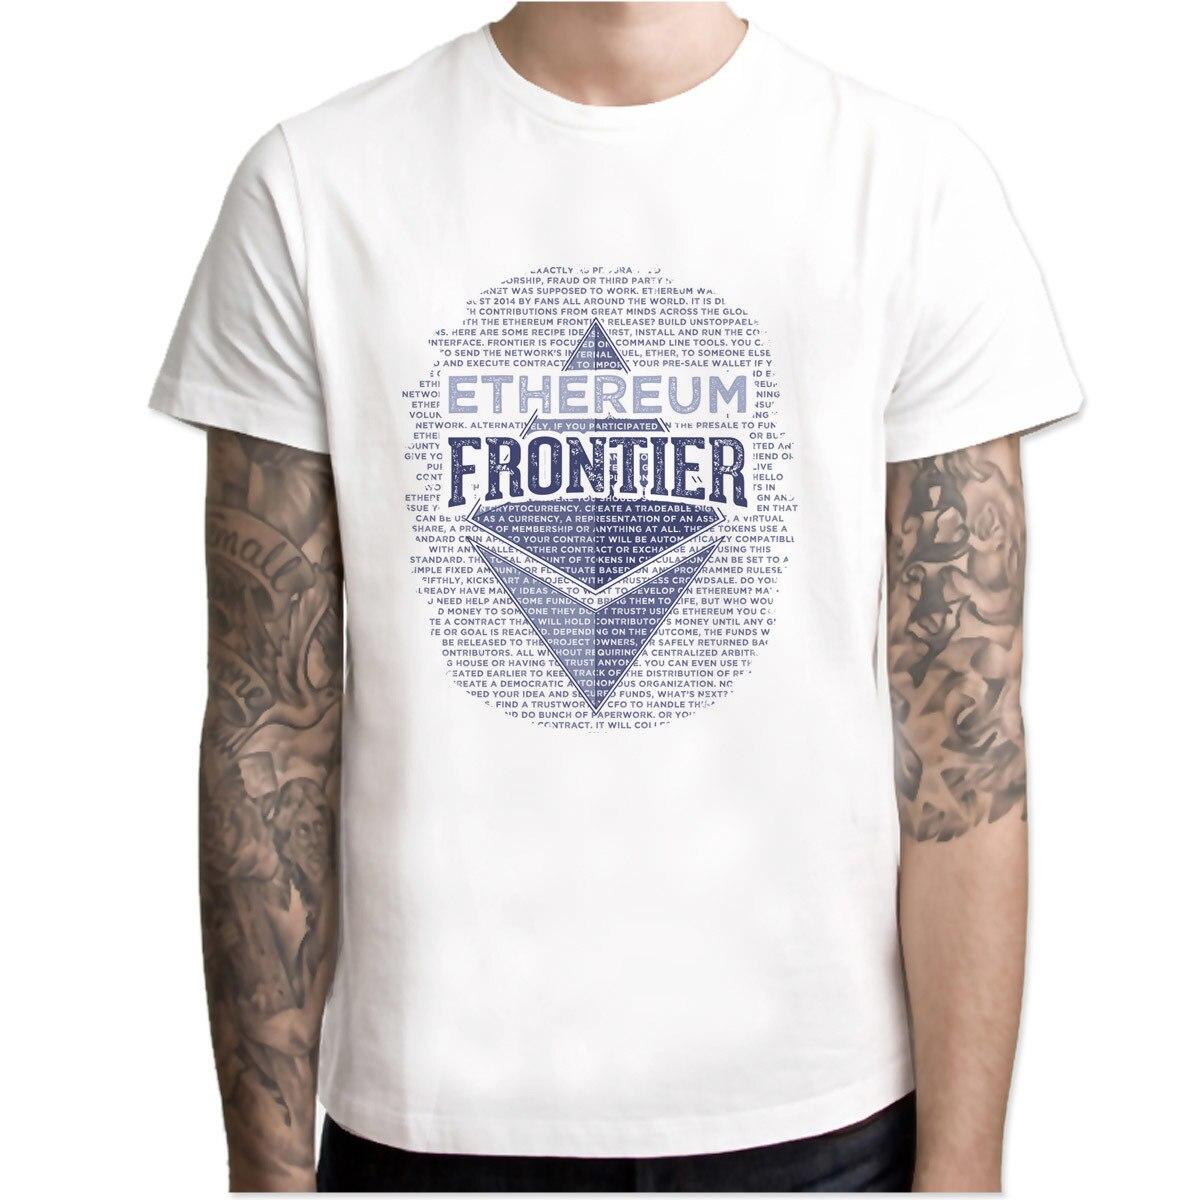 Ethereum Samsung Skin T shirt Hip Hop Style New Original Design T-shirt Cool Fashion Men tshirt Color M7R1133